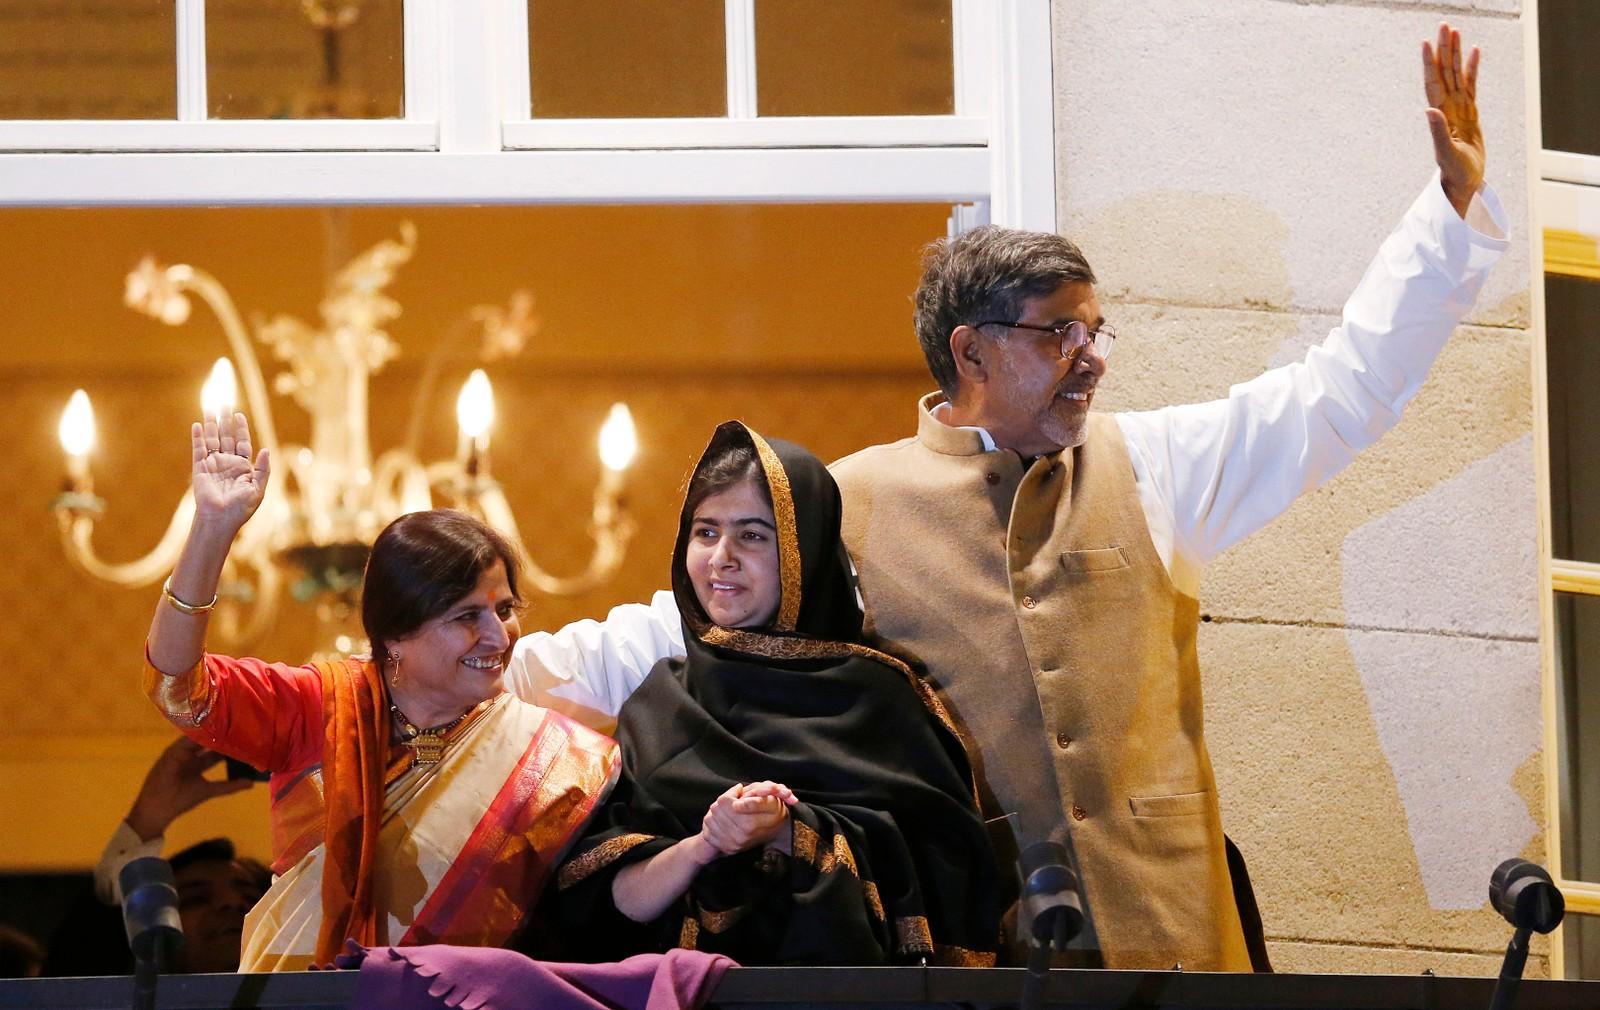 KONA: Kailash Satyarthi og Malala Yousafzai fikk selskap av Satyarthis kone Sumedha da de hilste fakkeltoget.